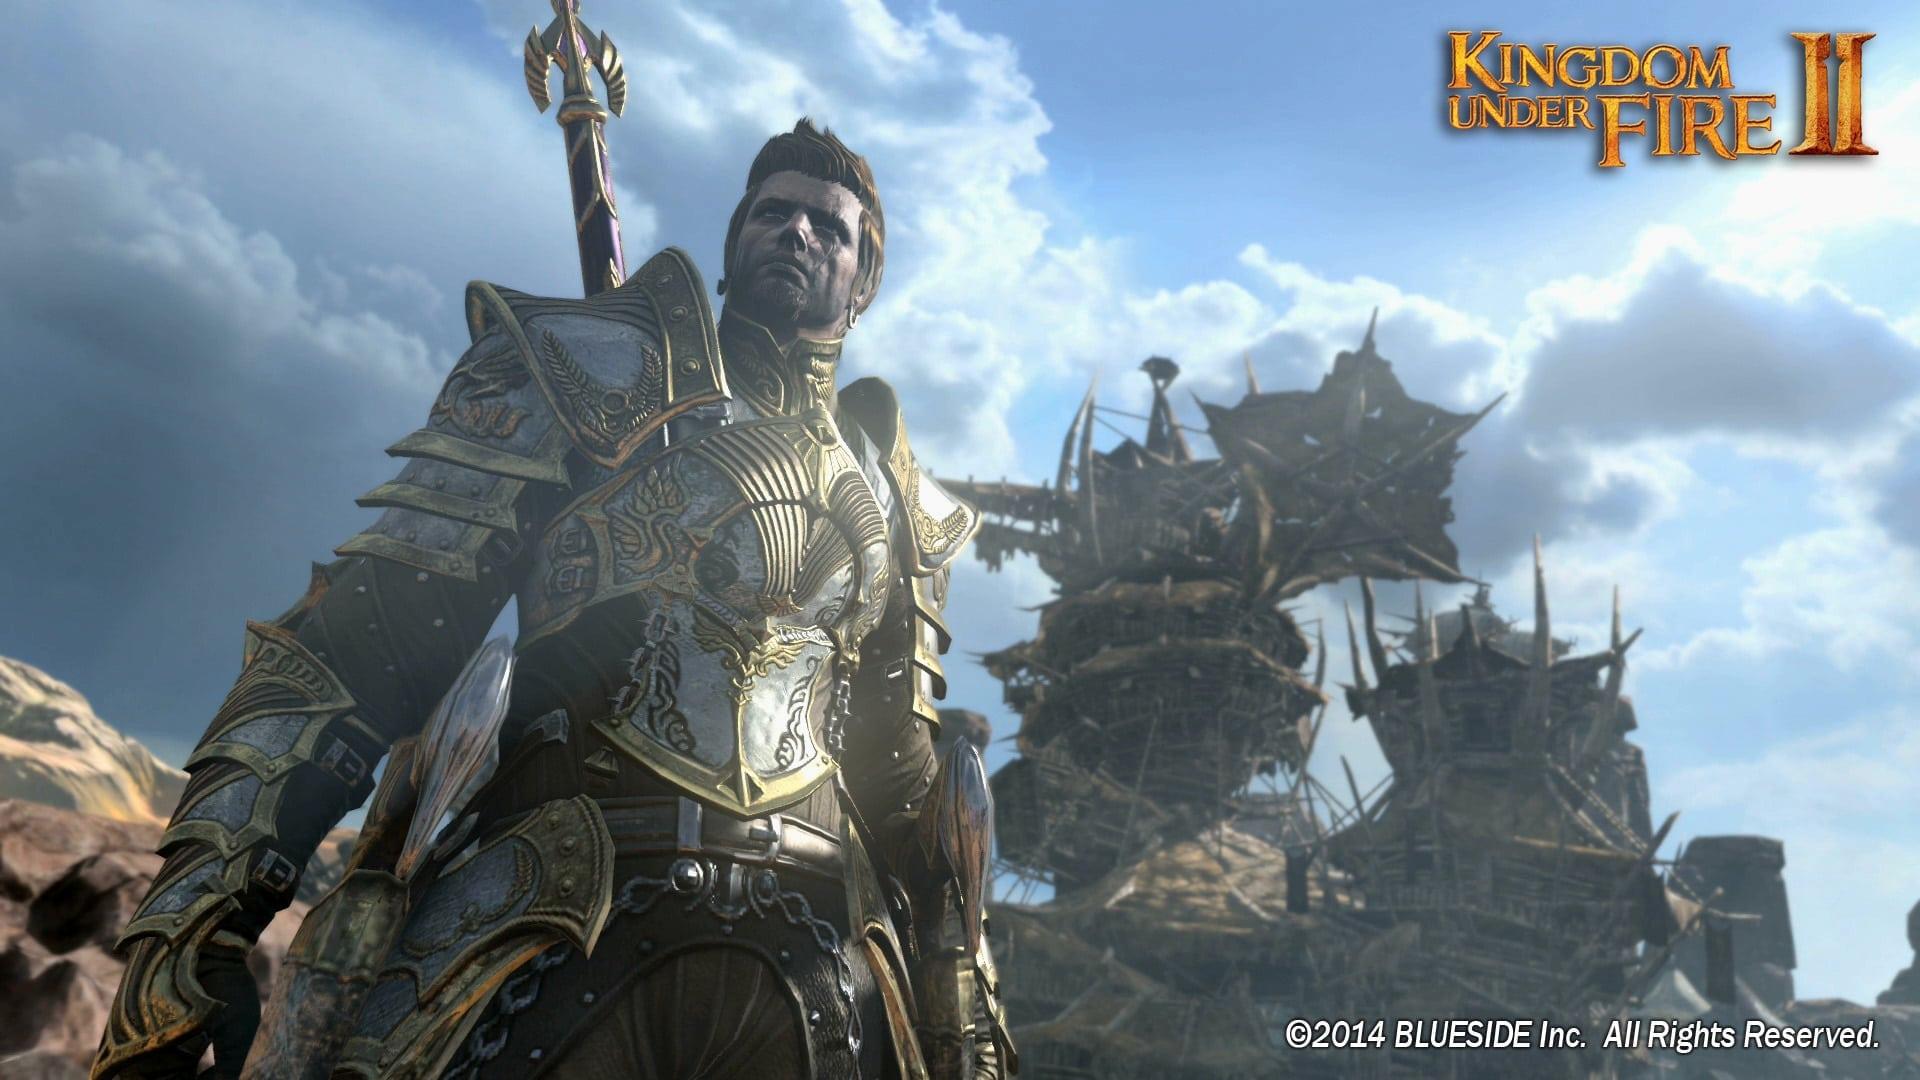 Kingdom Under Fire II - GDC 2014 screenshot 2.jpg